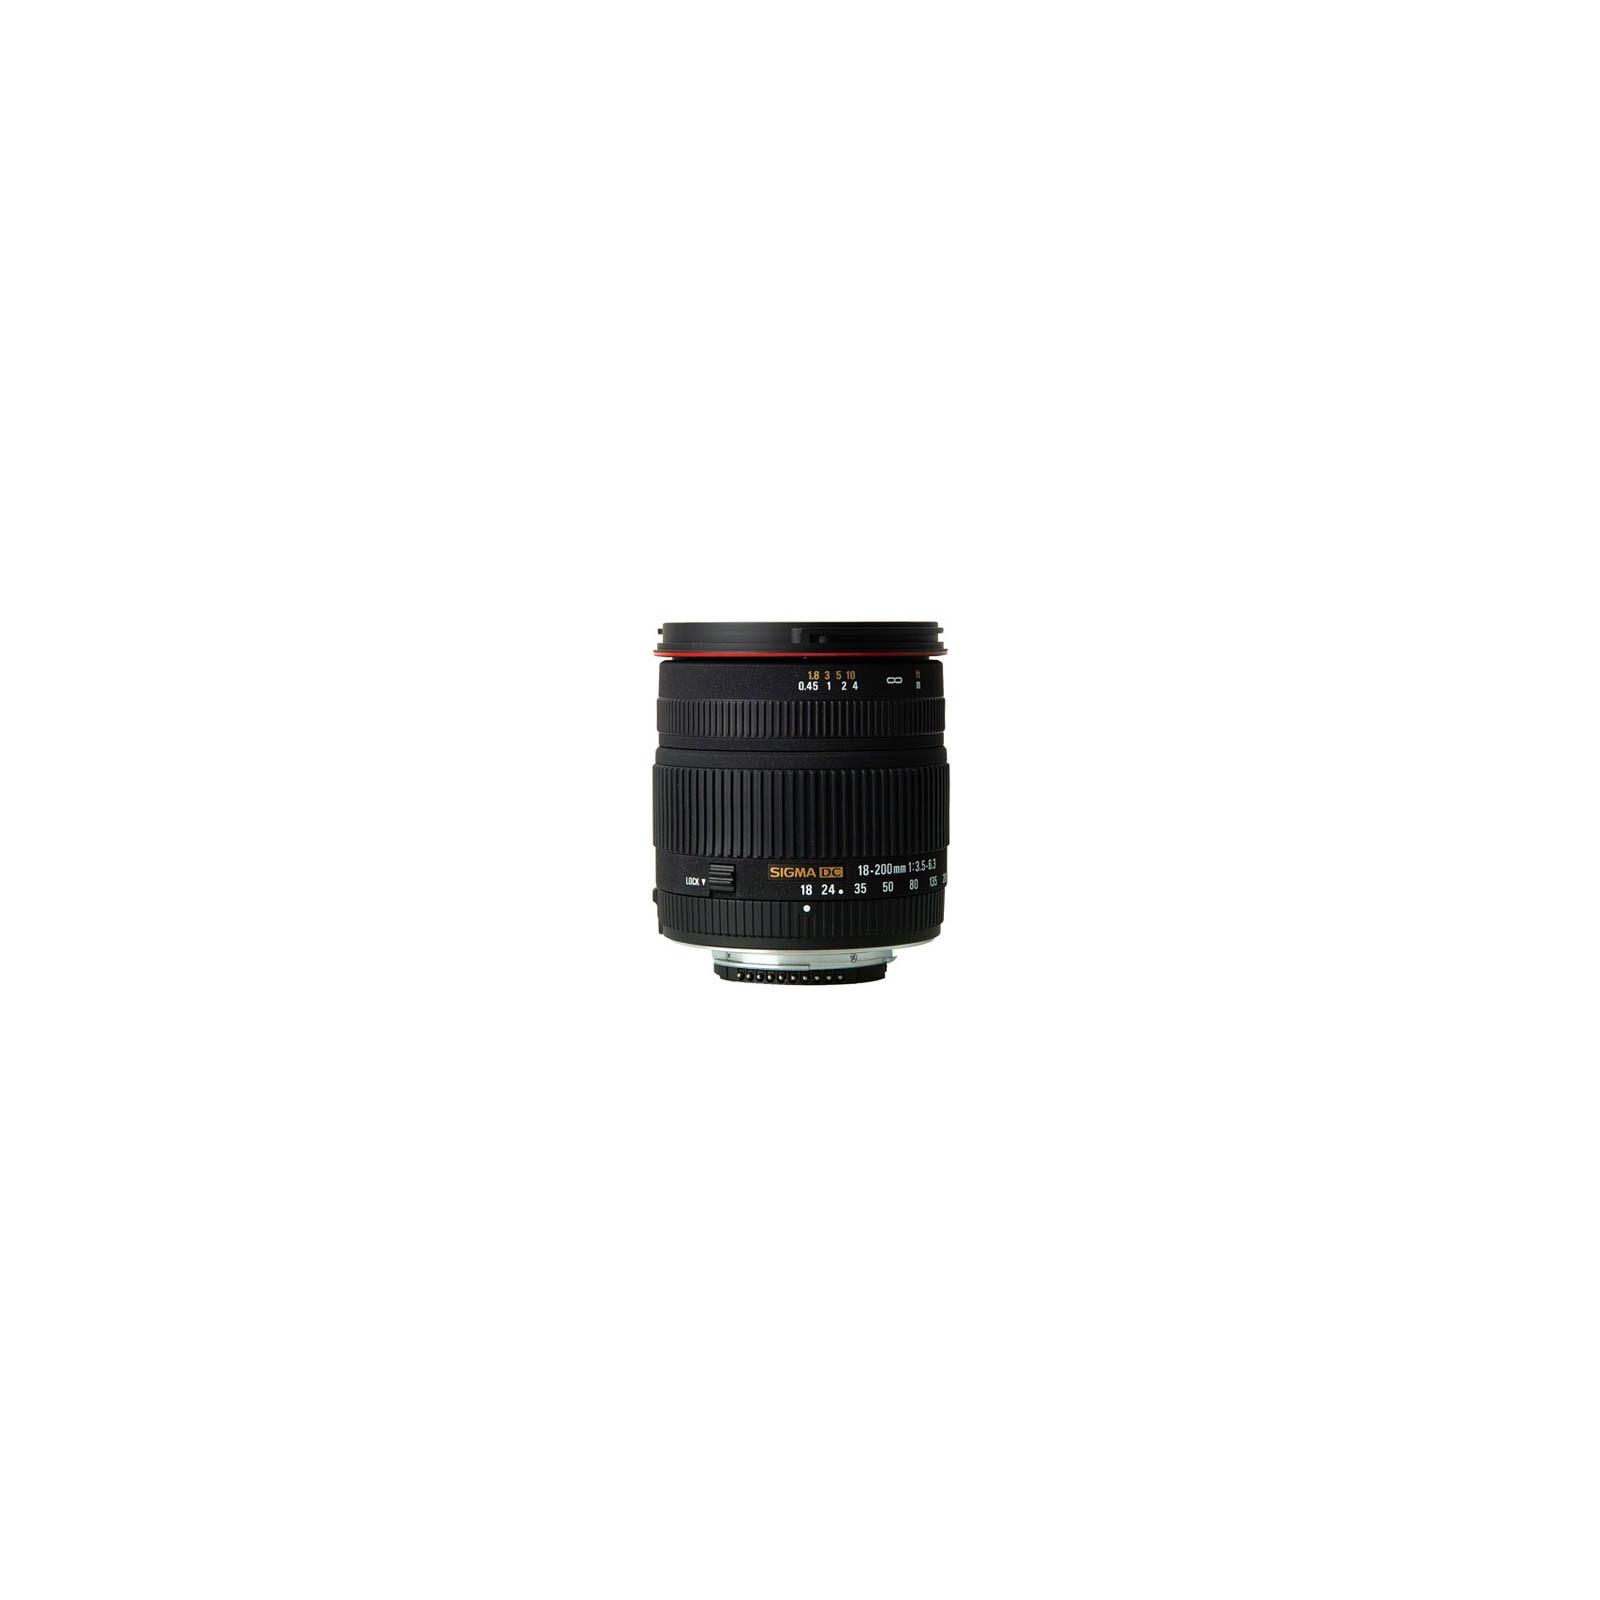 Объектив 18-200mm f/3.5-6.3 DC for Nikon Sigma (77D955)